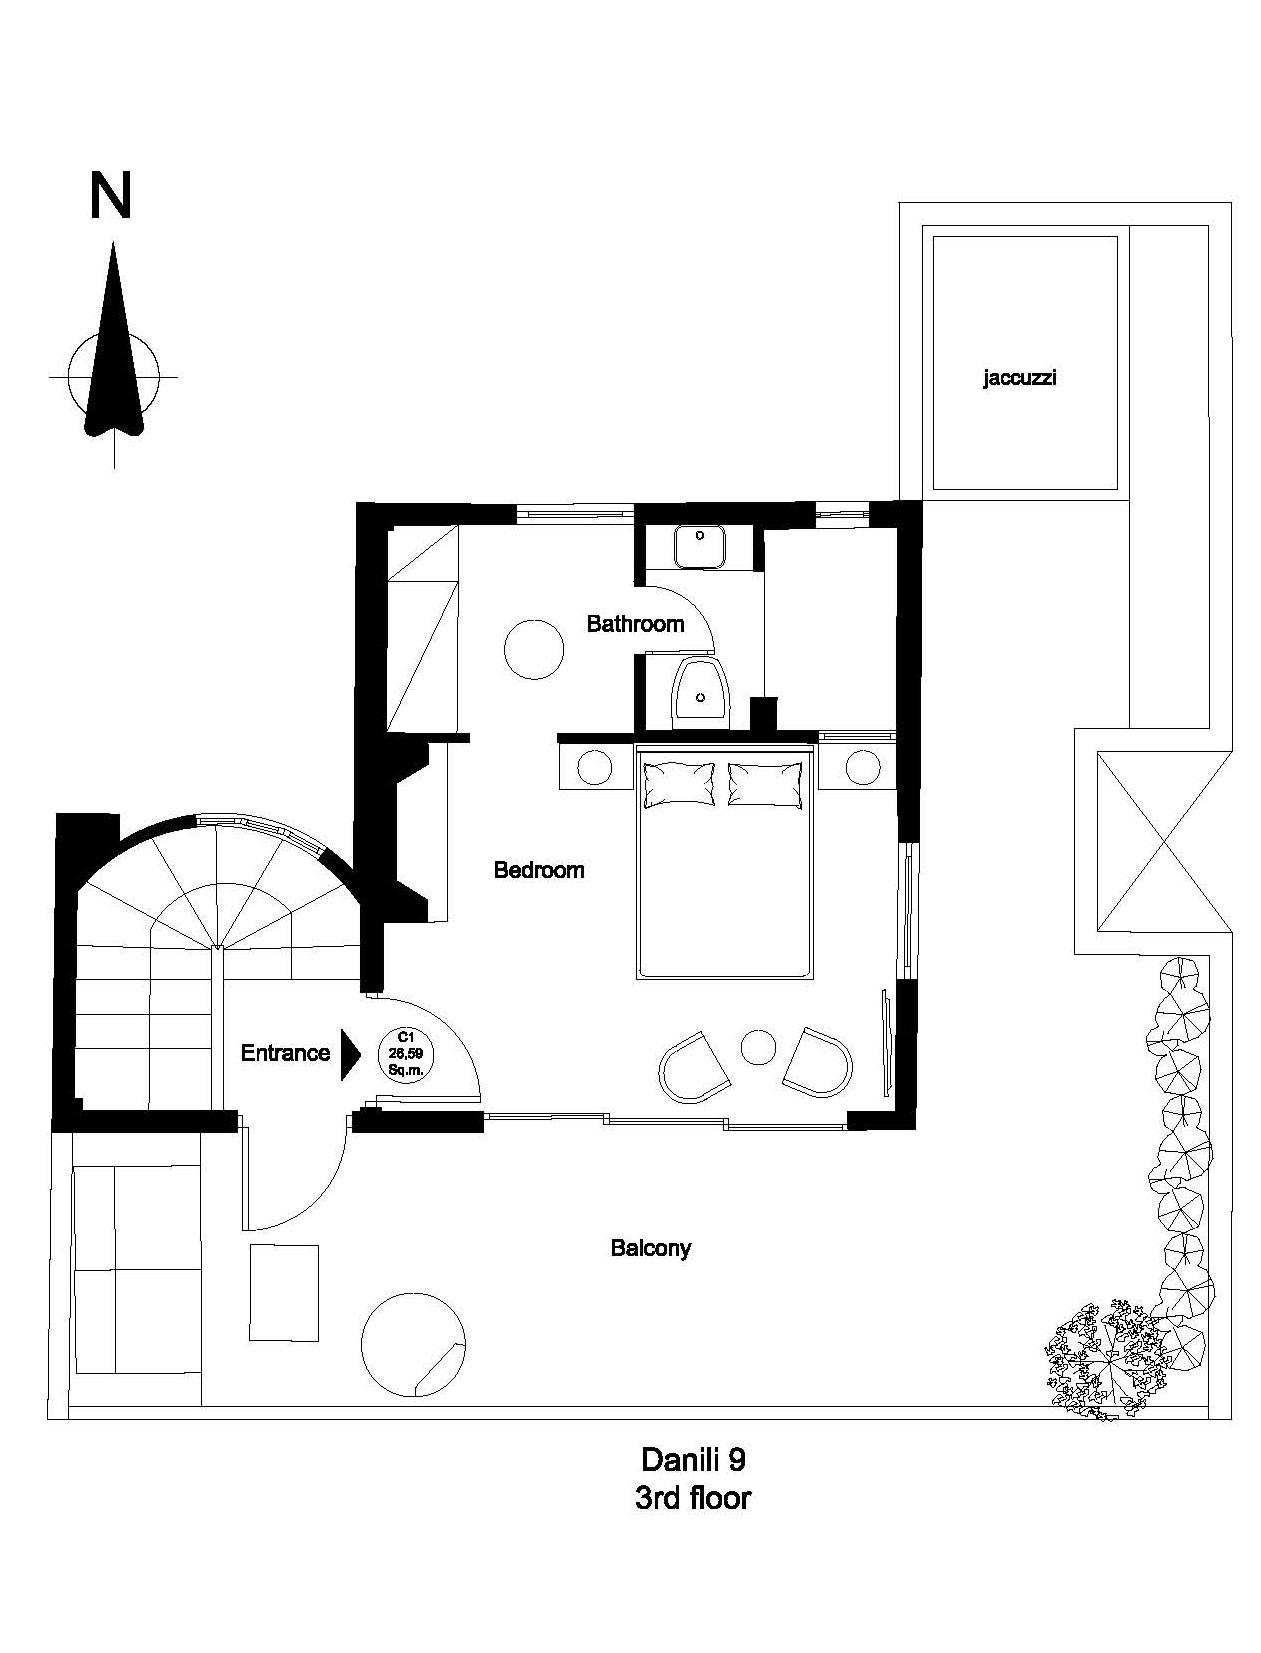 Danili 9 3rd floor plan